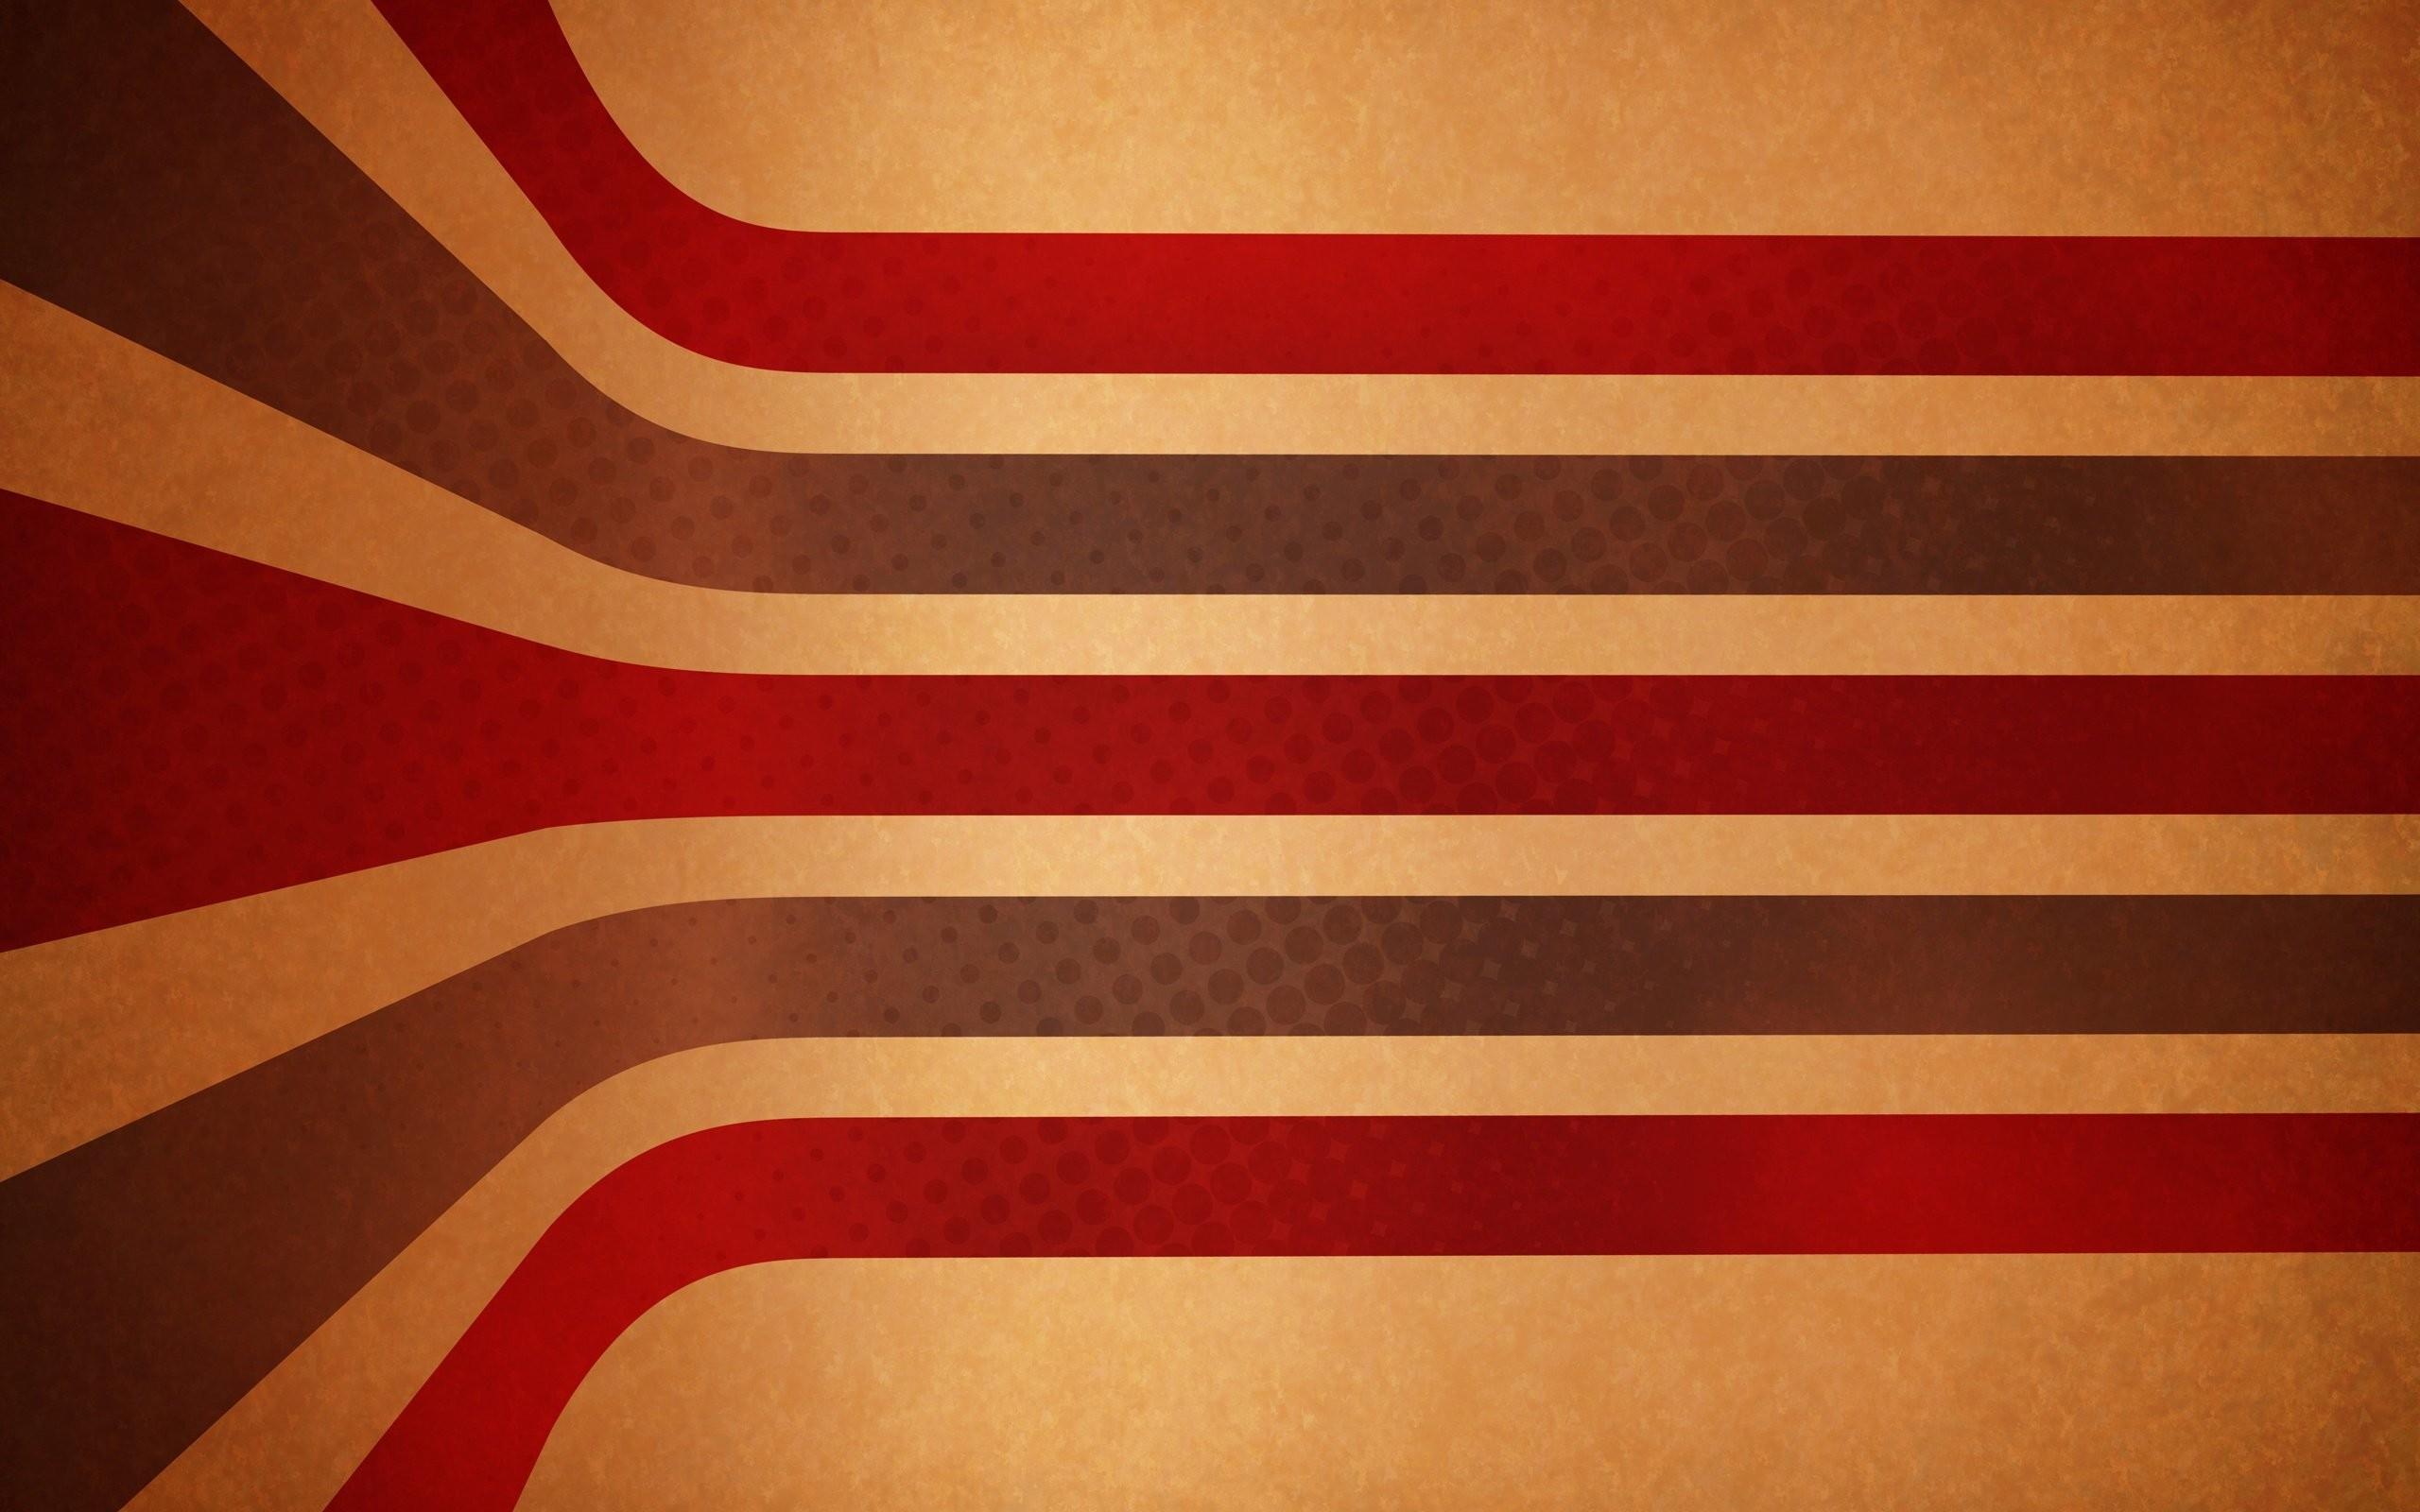 Texture Background 689573